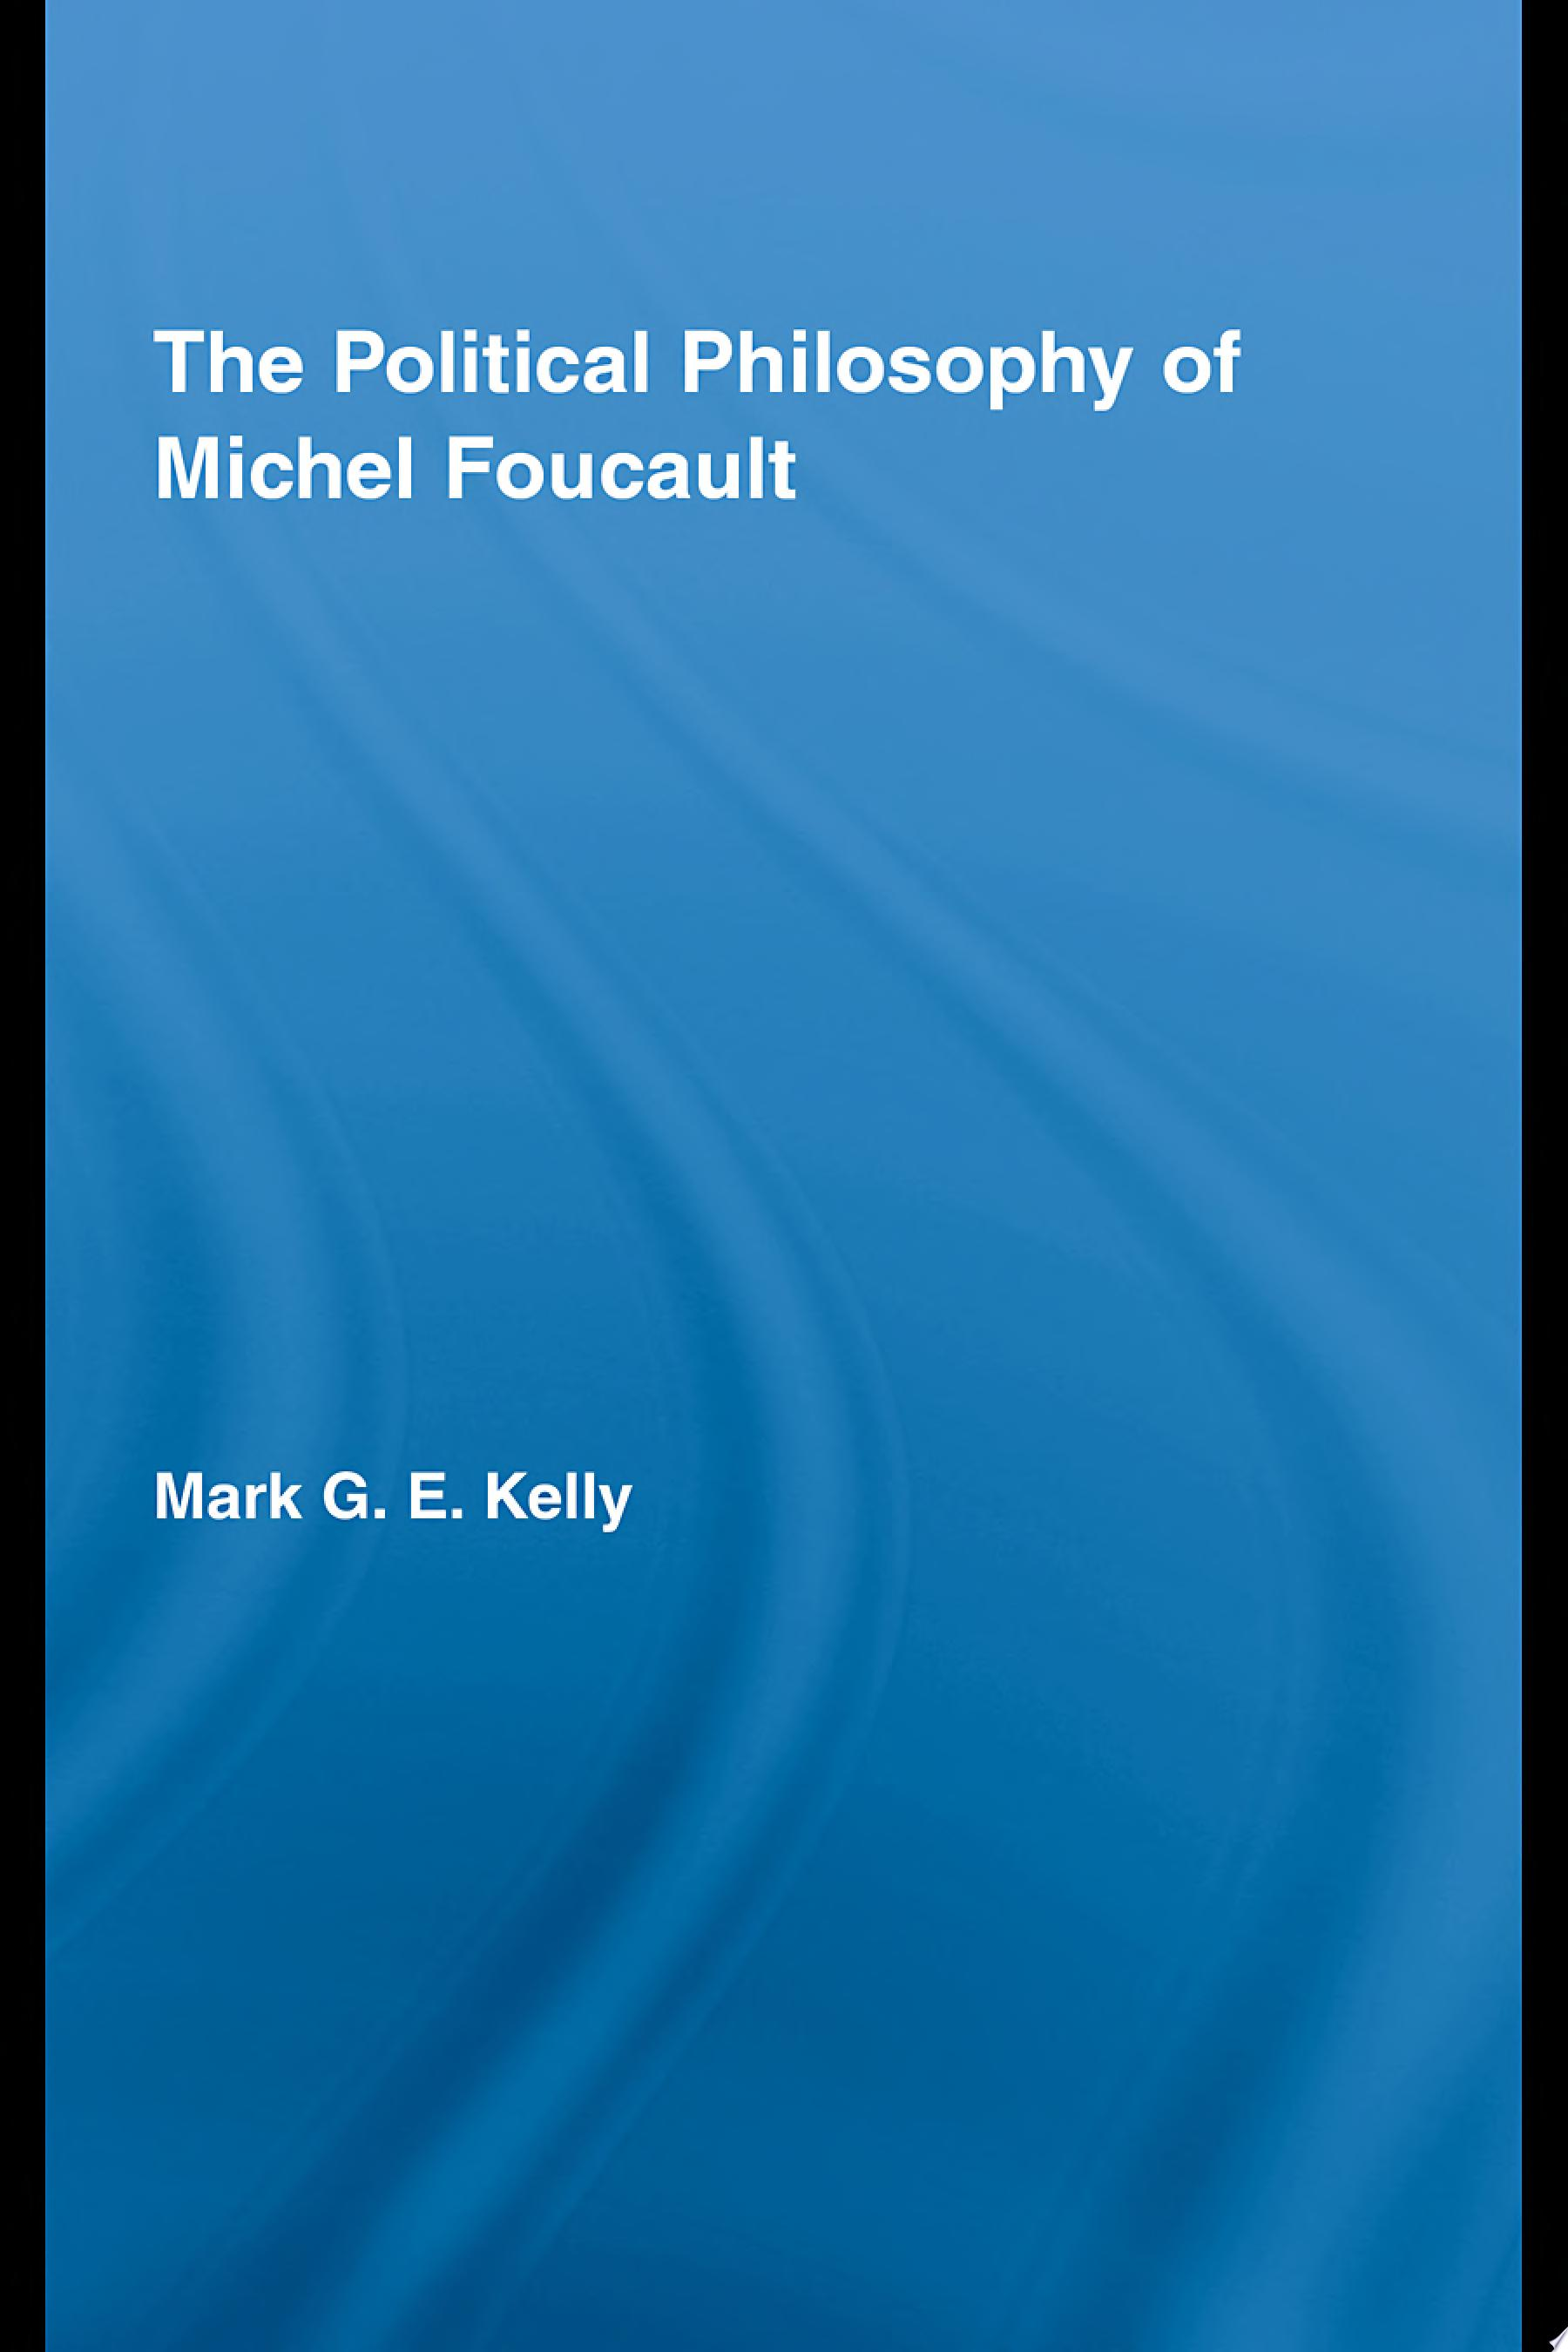 The Political Philosophy of Michel Foucault